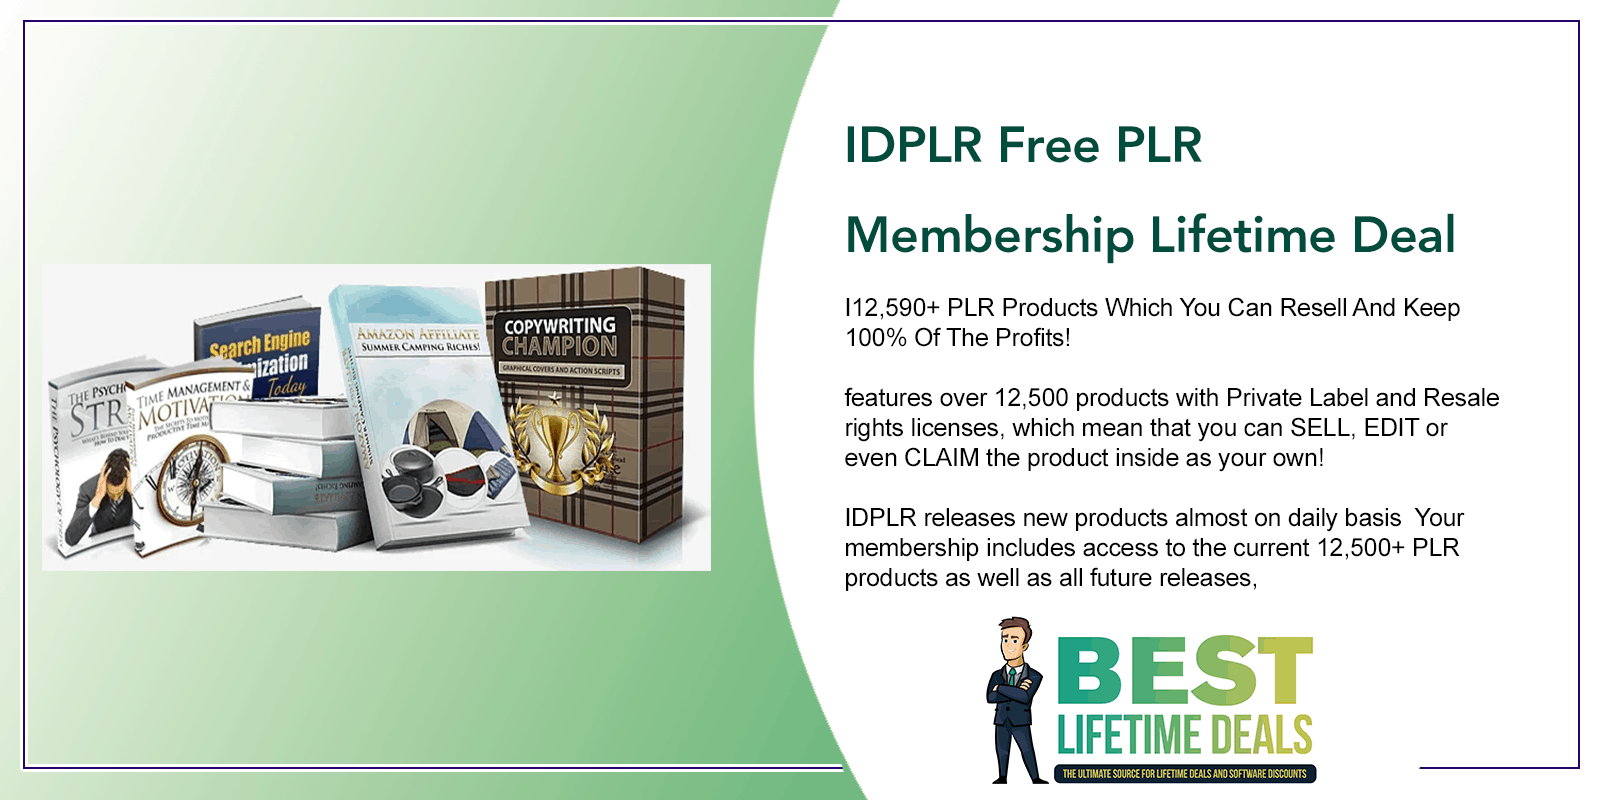 IDPLR Free PLR Membership Featured Image